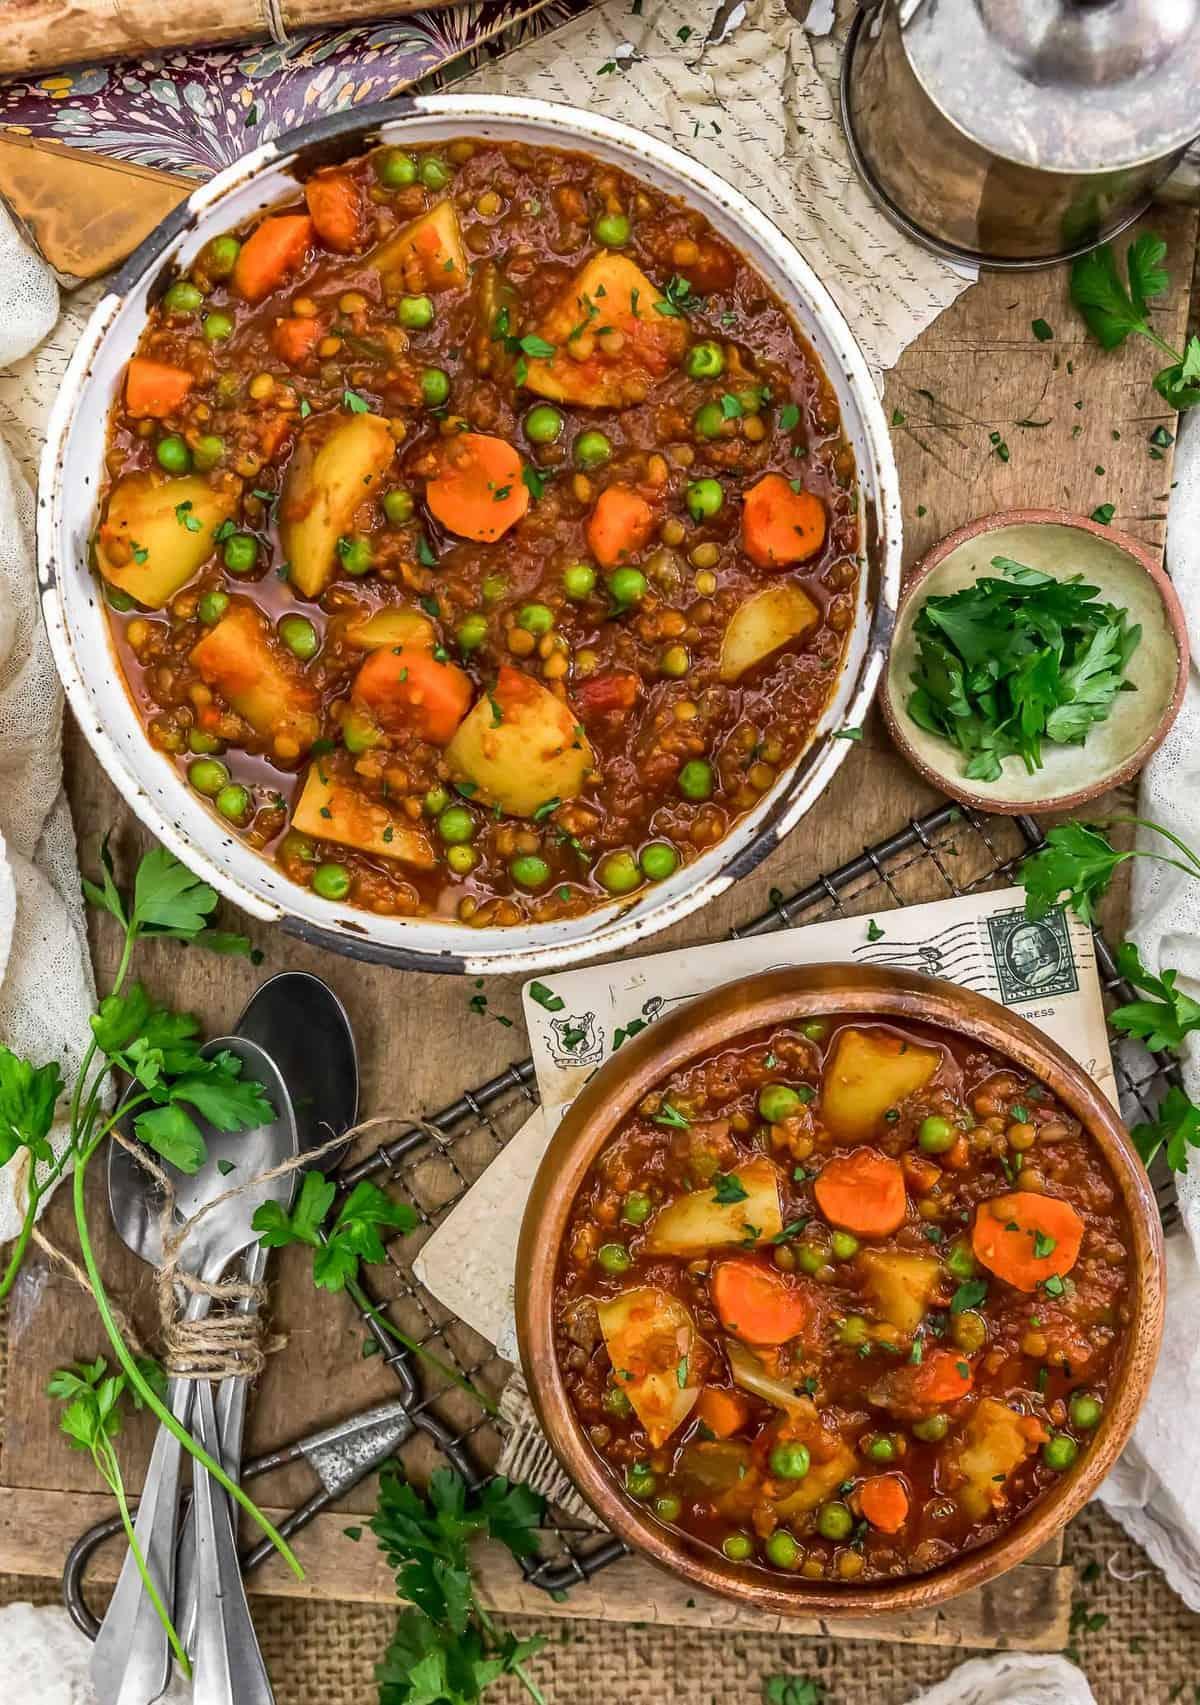 Tablescape of Hungarian Lentil Vegetable Stew